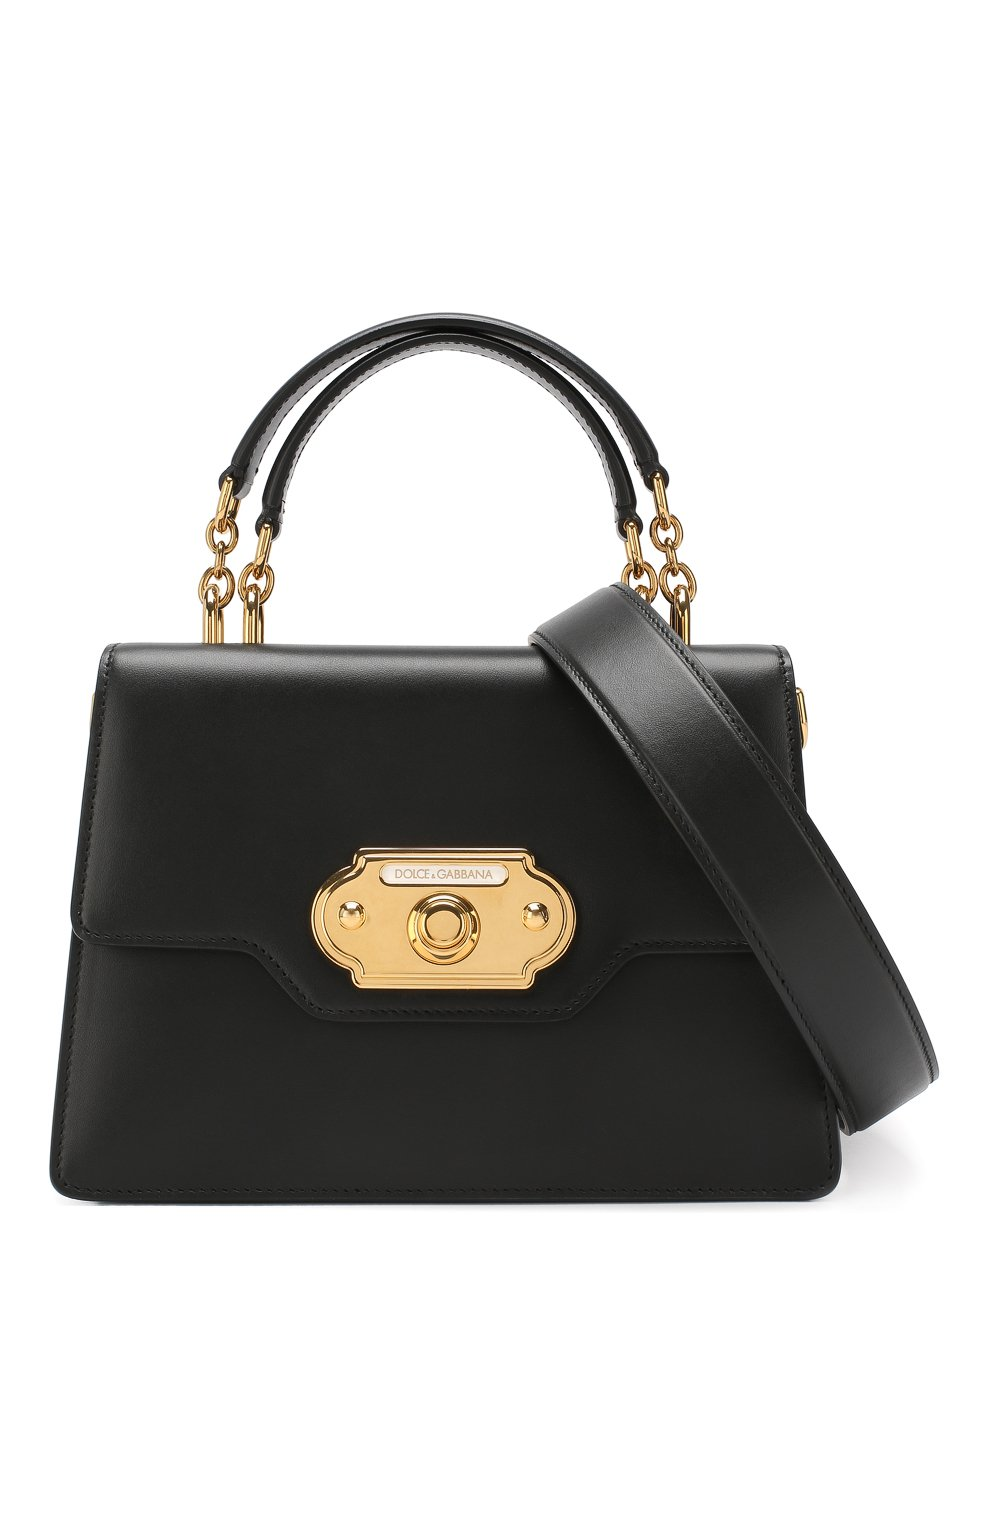 bafdd38e8f0a Женская сумка welcome DOLCE & GABBANA черная цвета — купить за ...